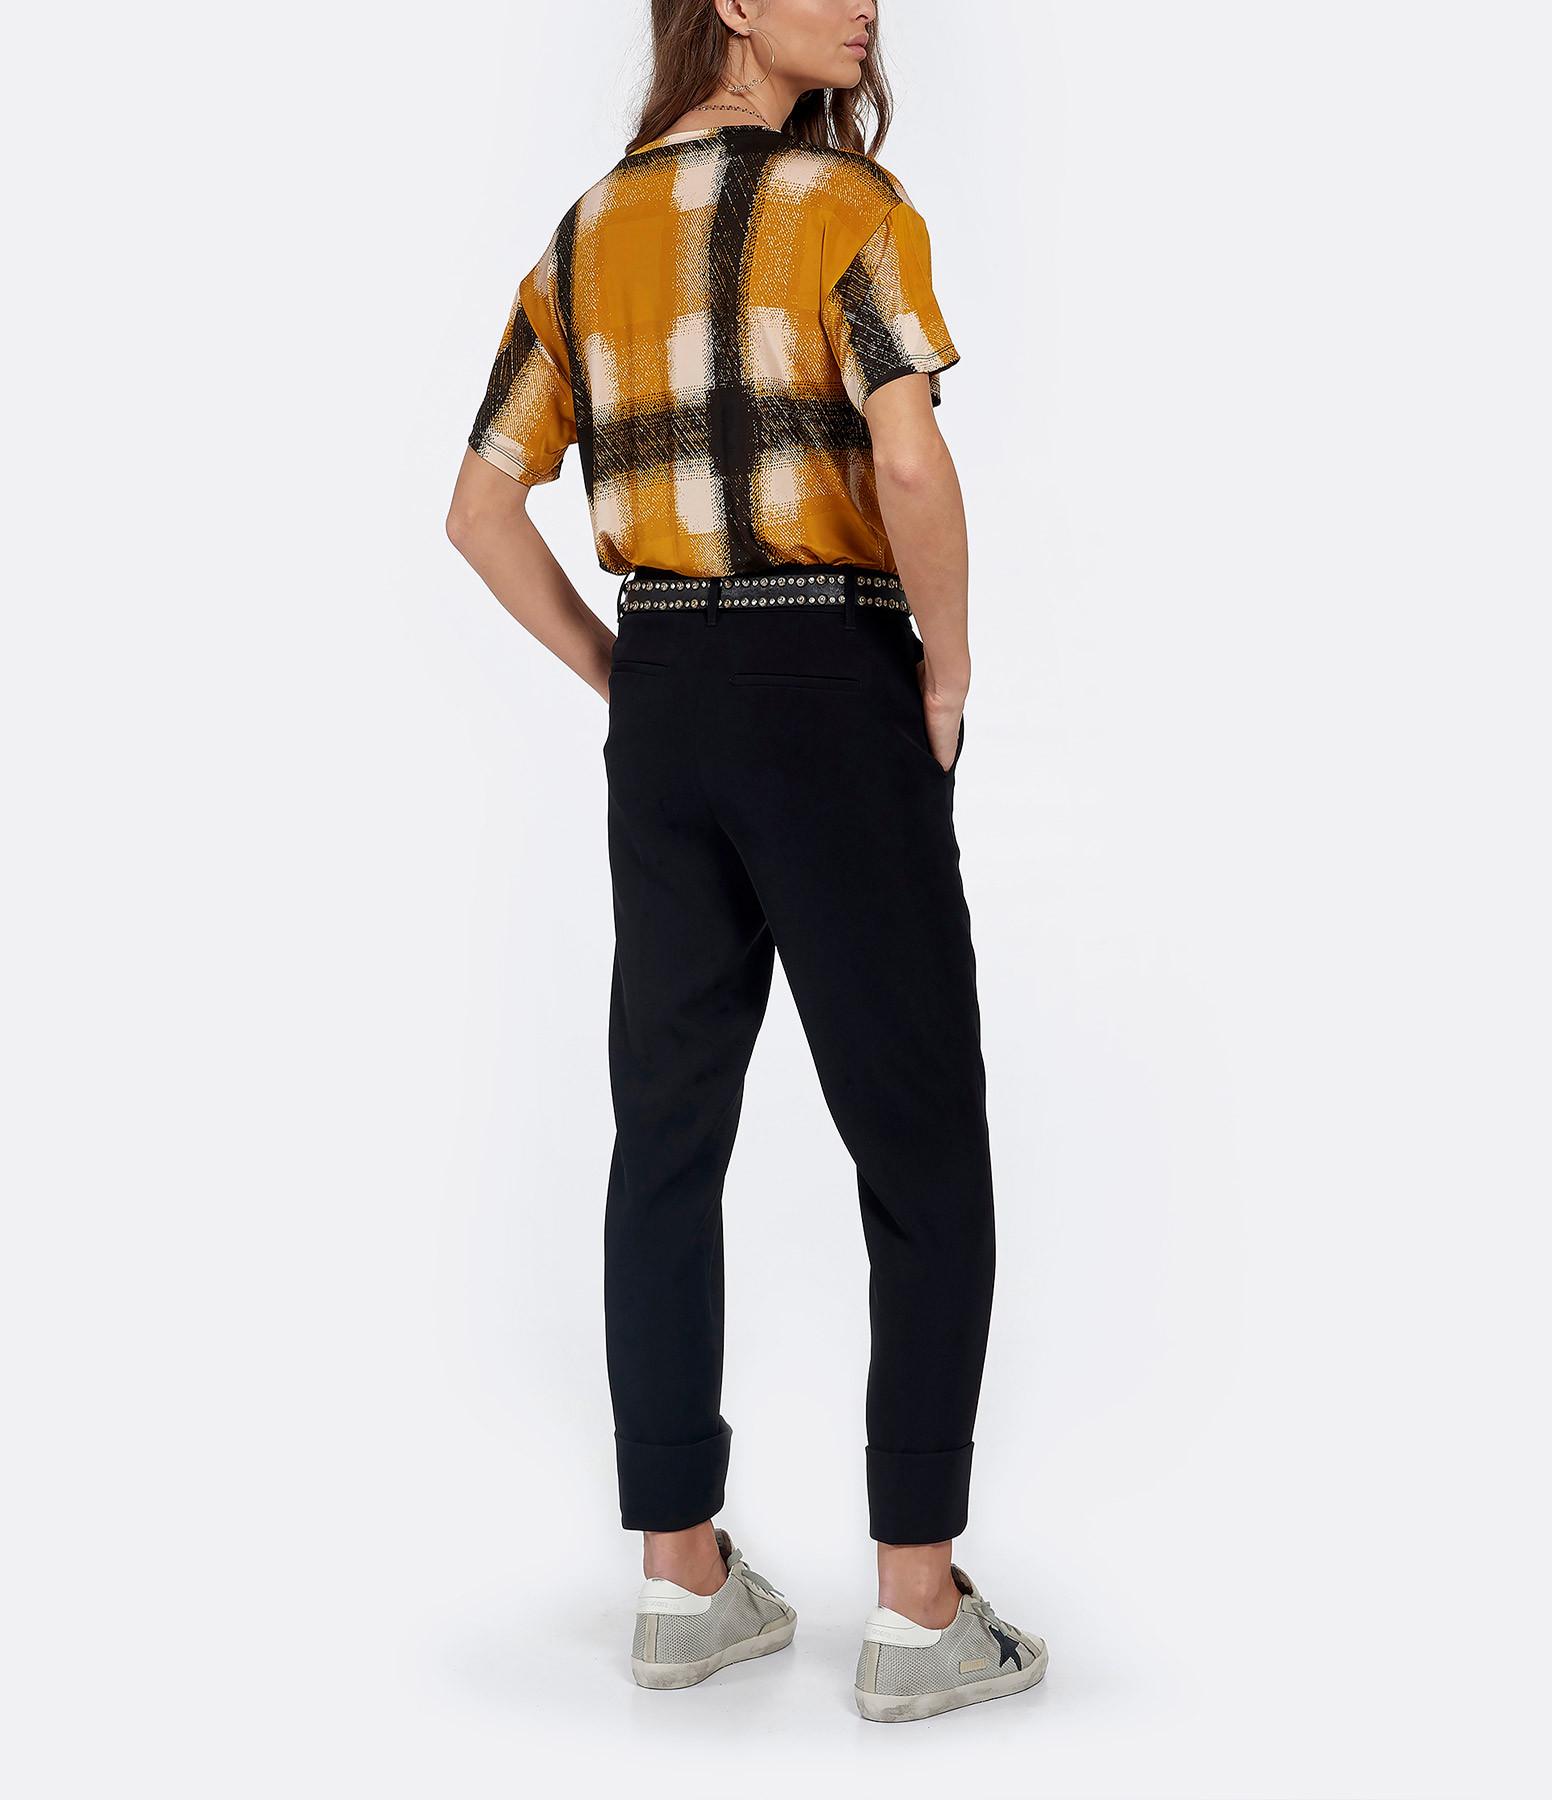 RABENS SALONER - Tee-shirt Geometrique Benette Jaune